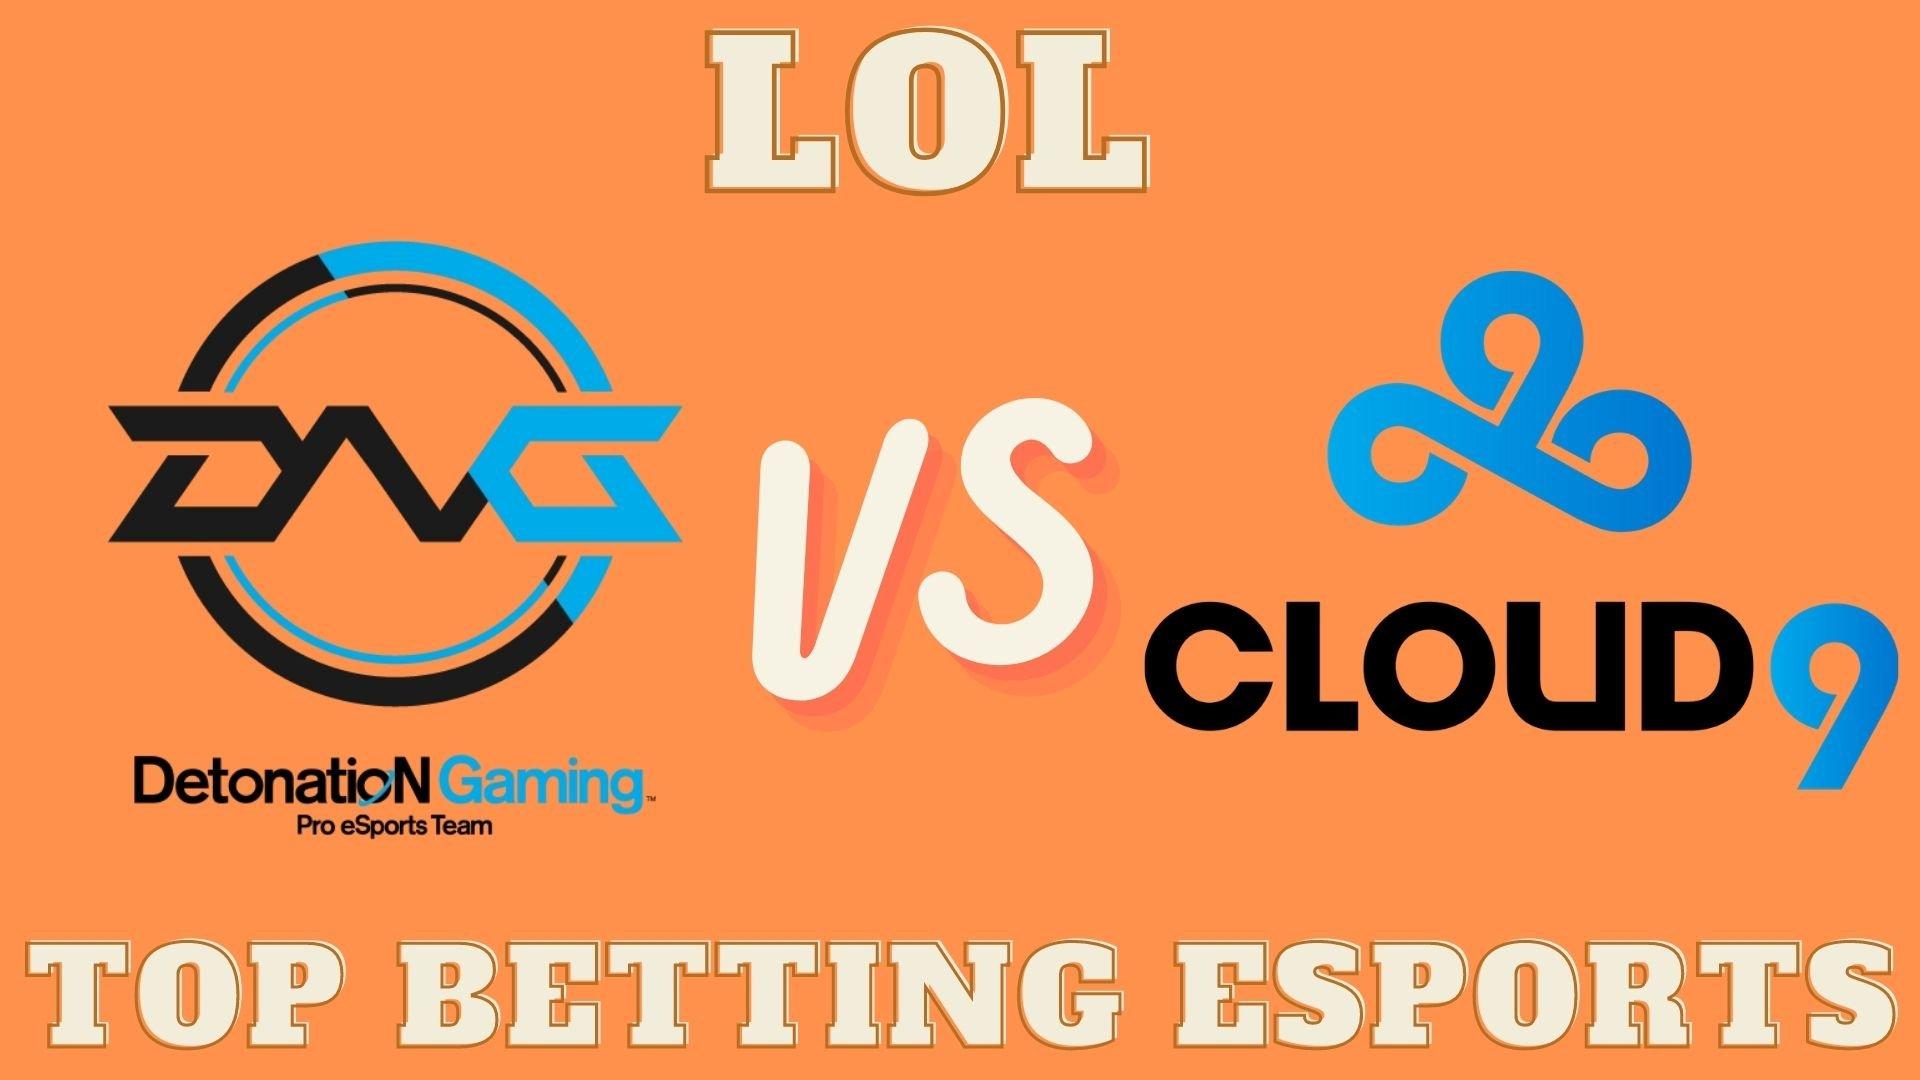 MSI LOL DetonatioN FM vs Cloud9 Betting prediction 05.07.2021